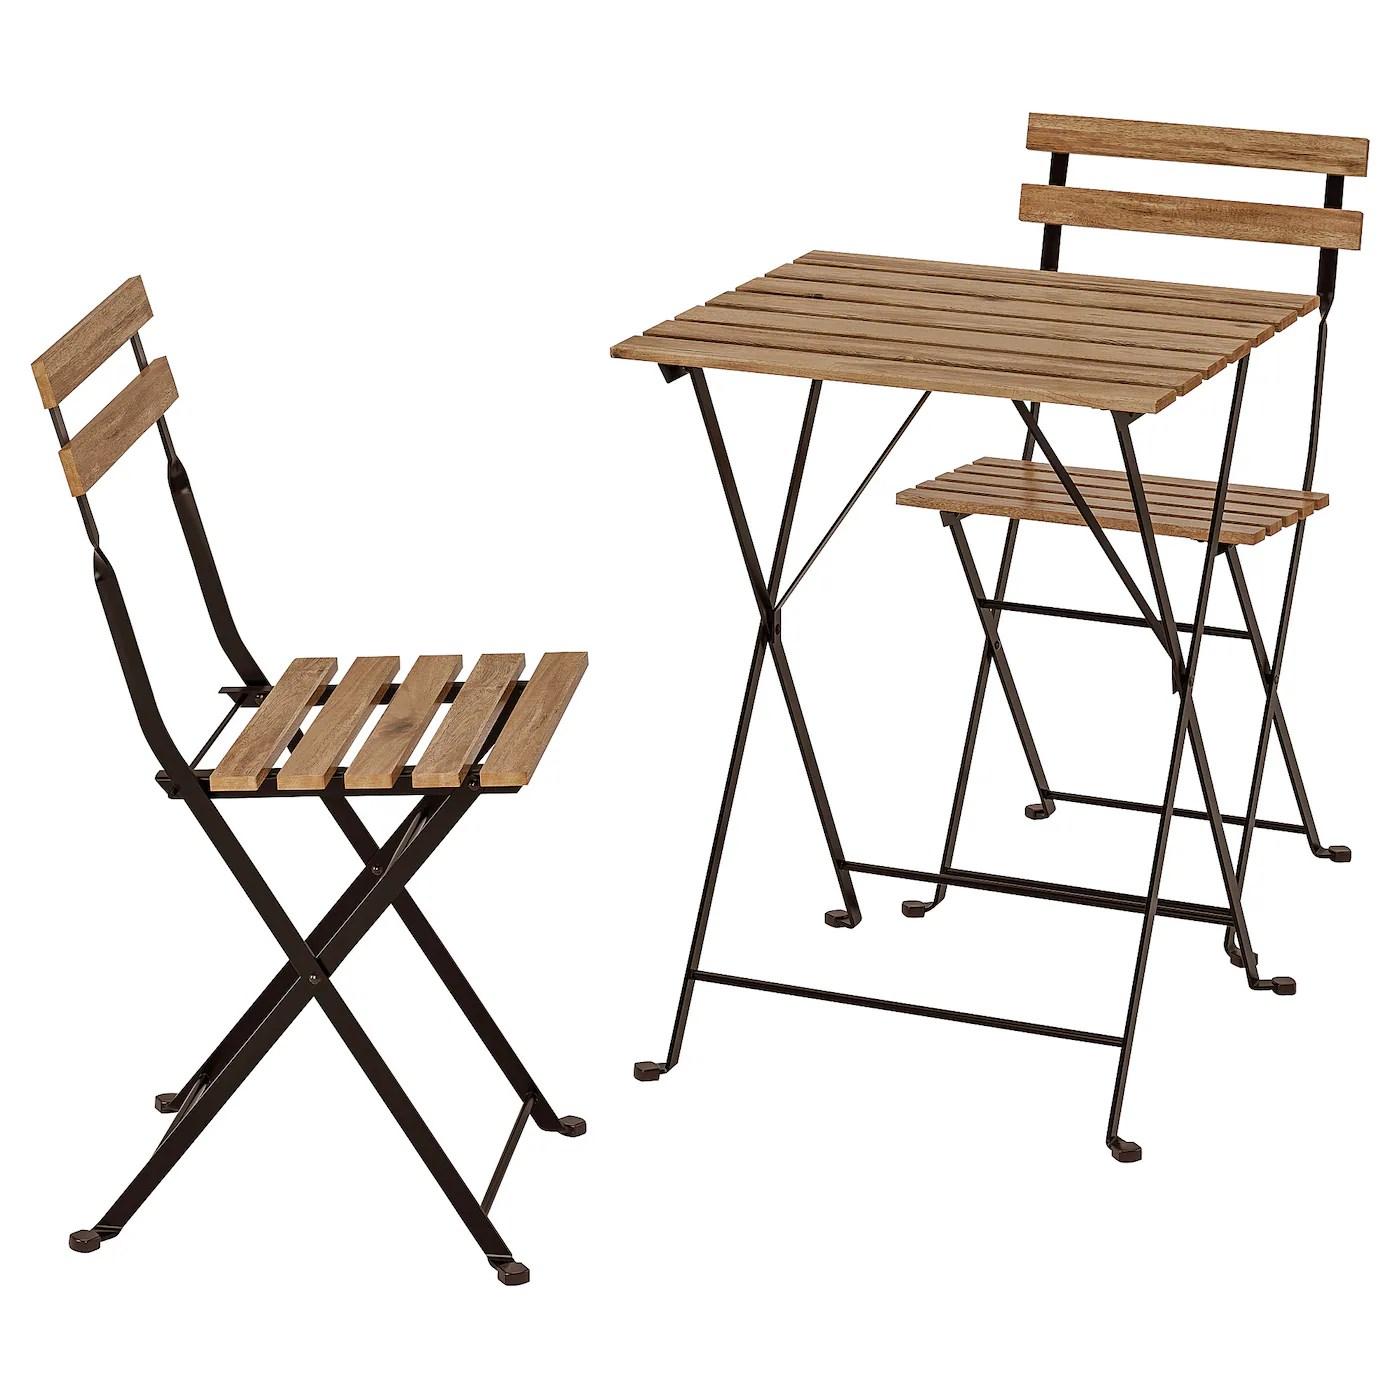 Tarno Table 2 Chairs 698 984 15 Ikea